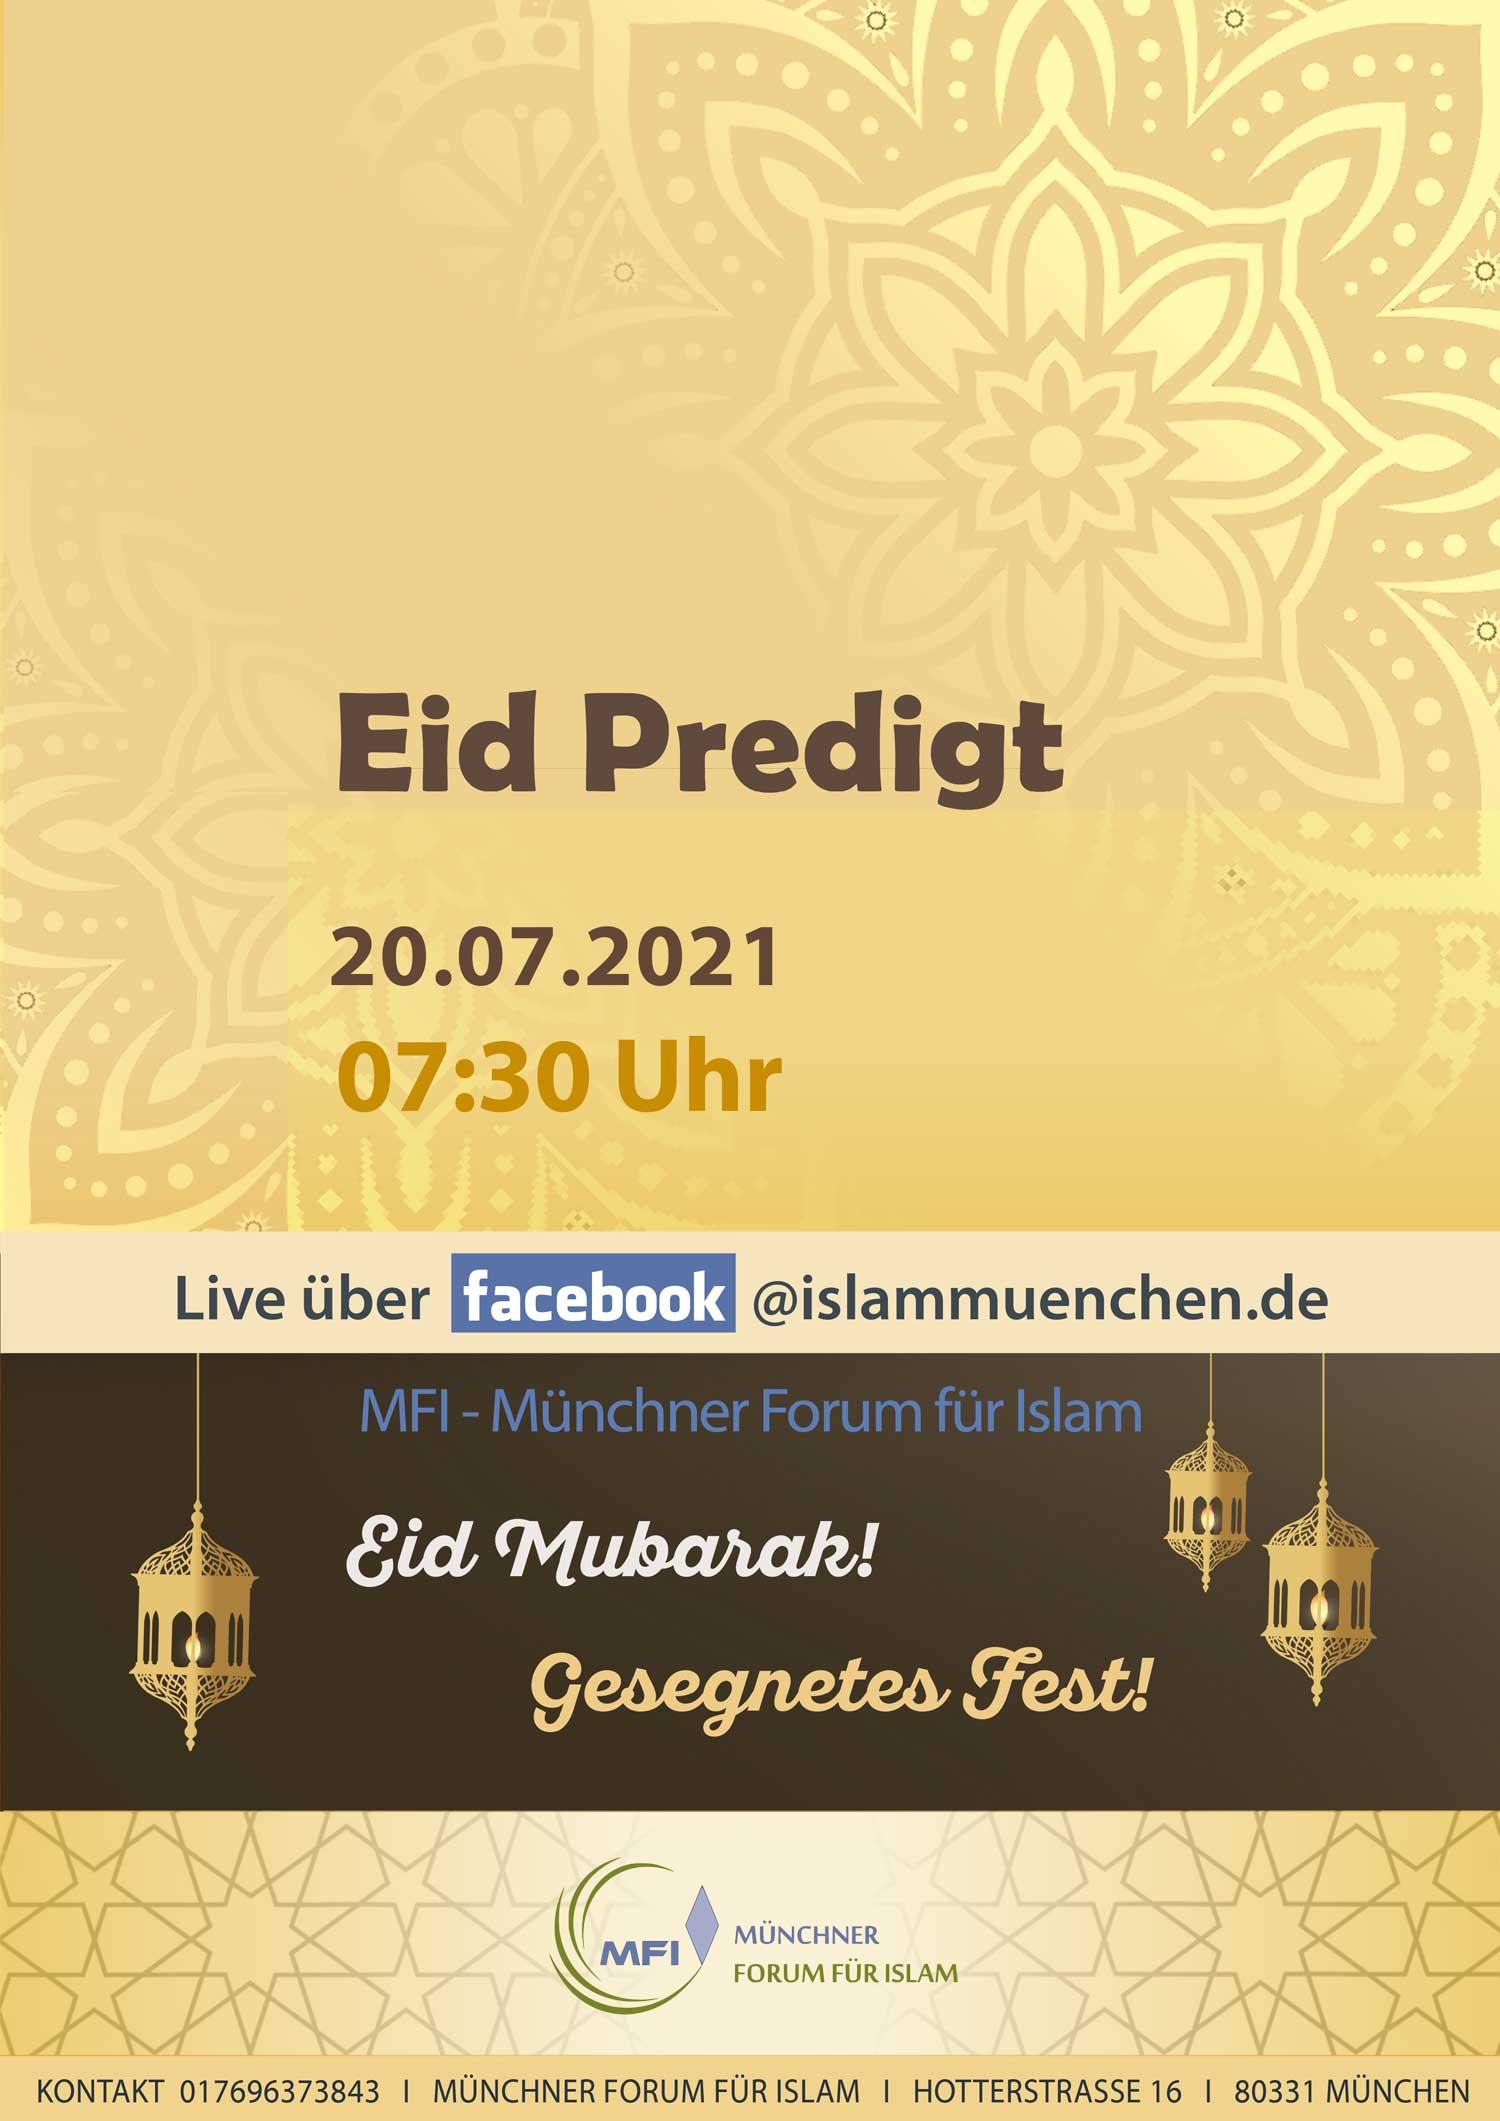 Eid Predigt Juli 2021